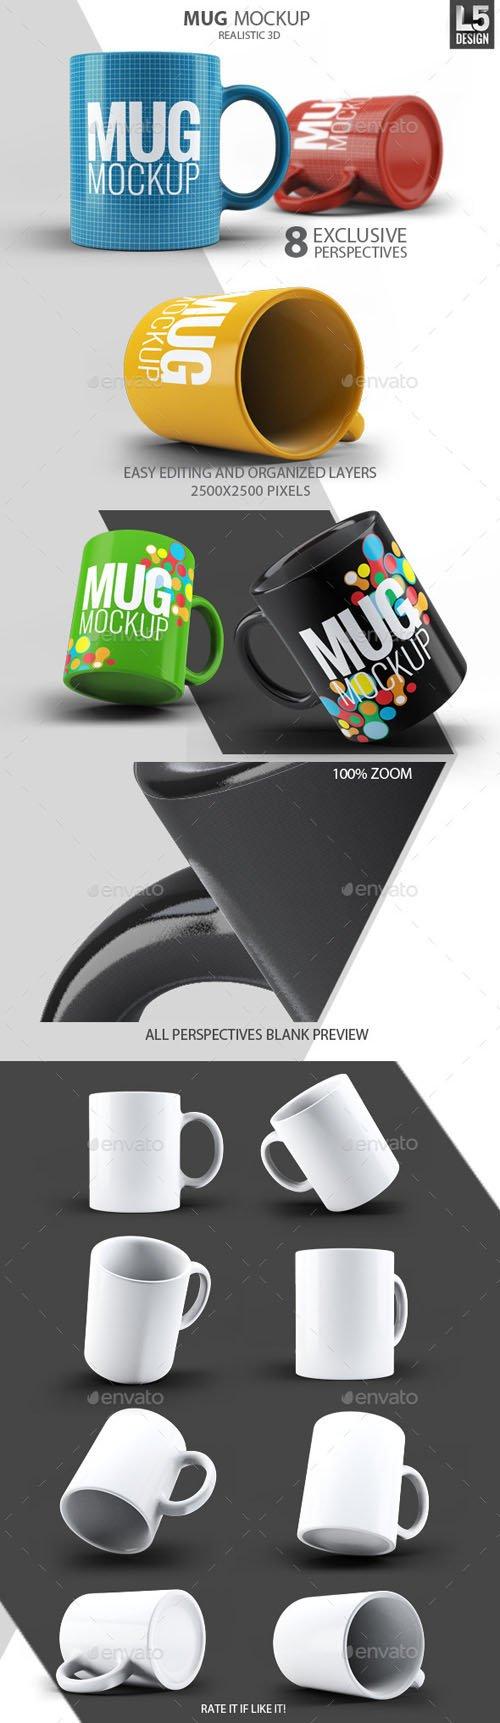 Mug Mock-Up - Graphicriver 10474401